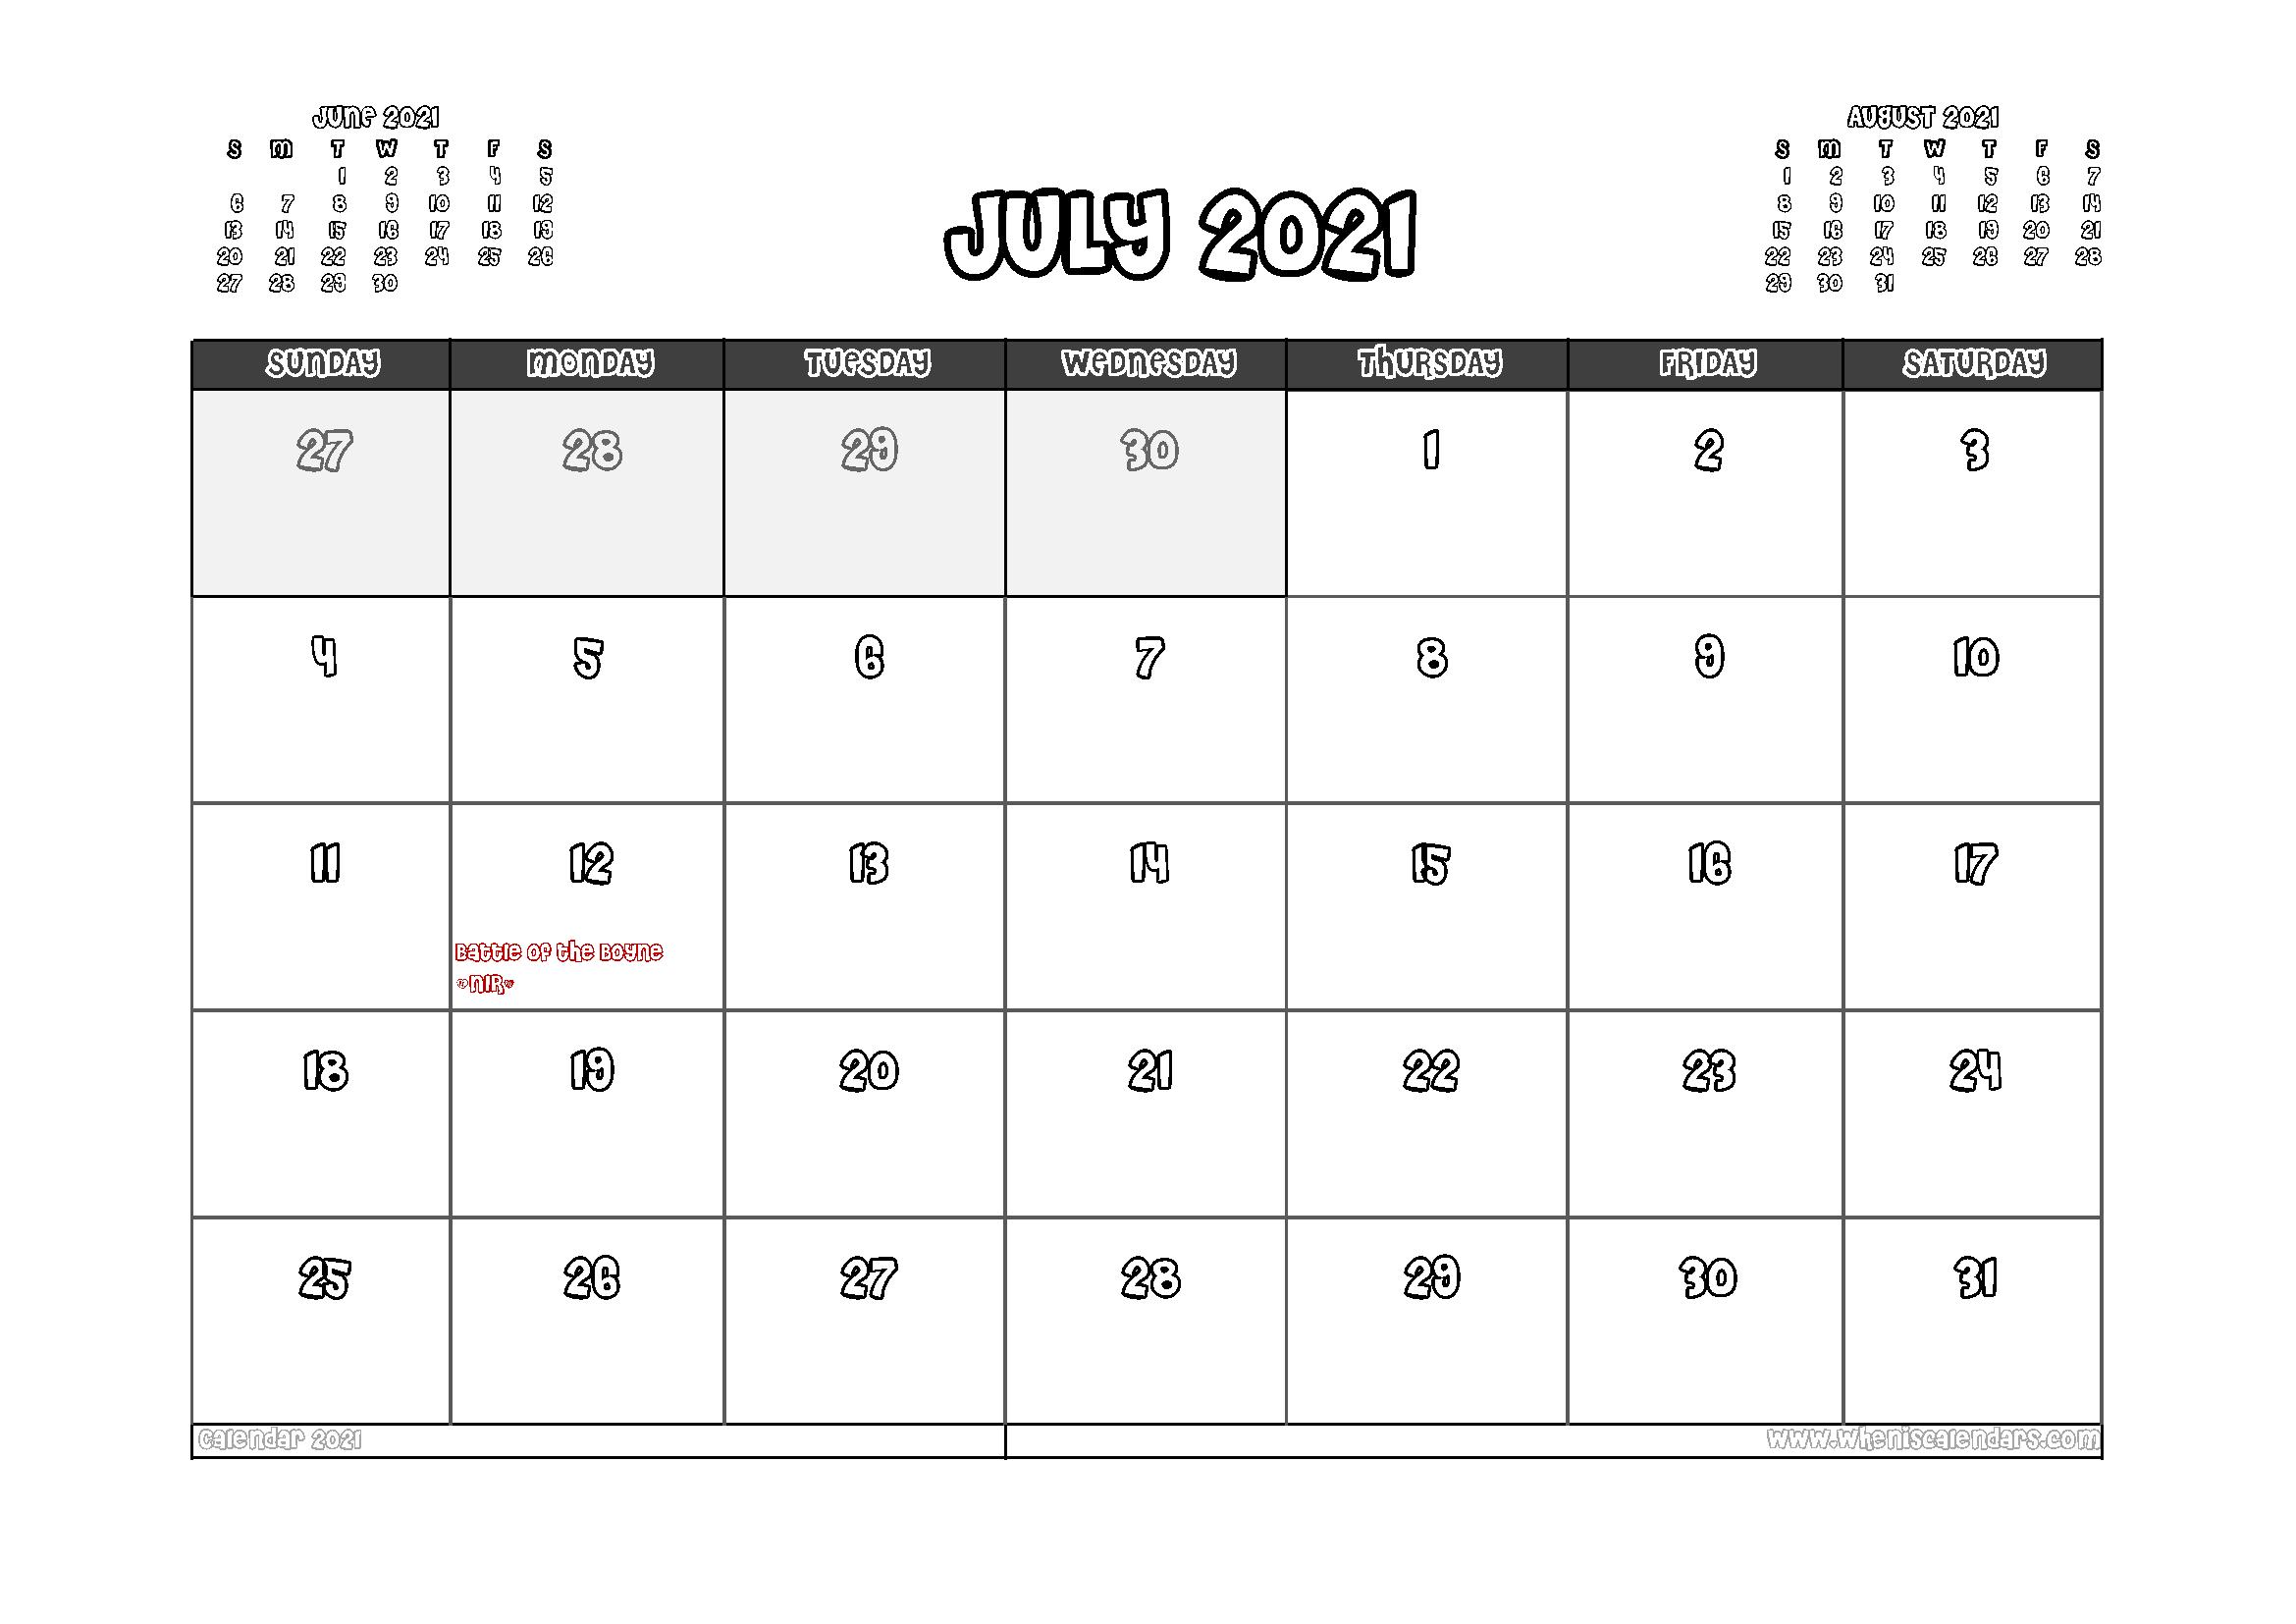 Free Printable July 2021 Calendar UK